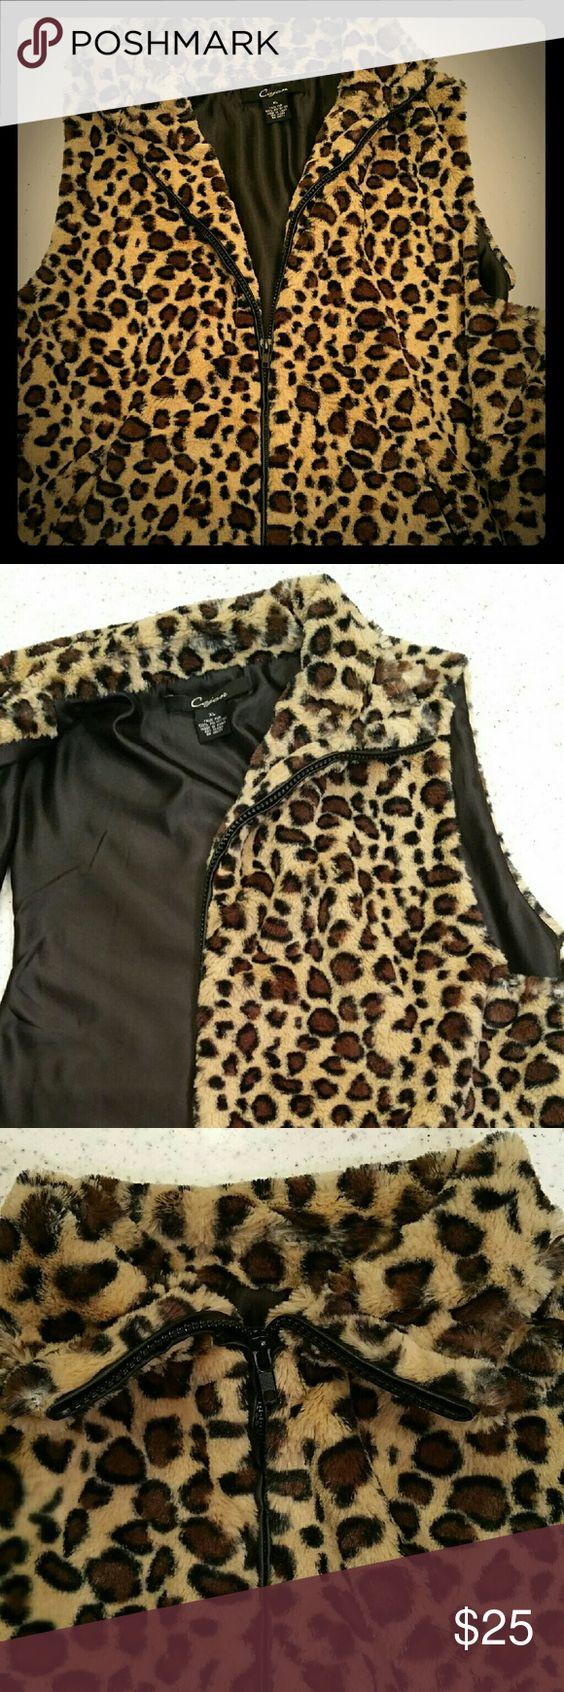 Faux Fur Leopard Vest Sleeveless women's leopard print vest, good condition, zip front, side pockets, fully lined,  worn a few times. Jackets & Coats Vests